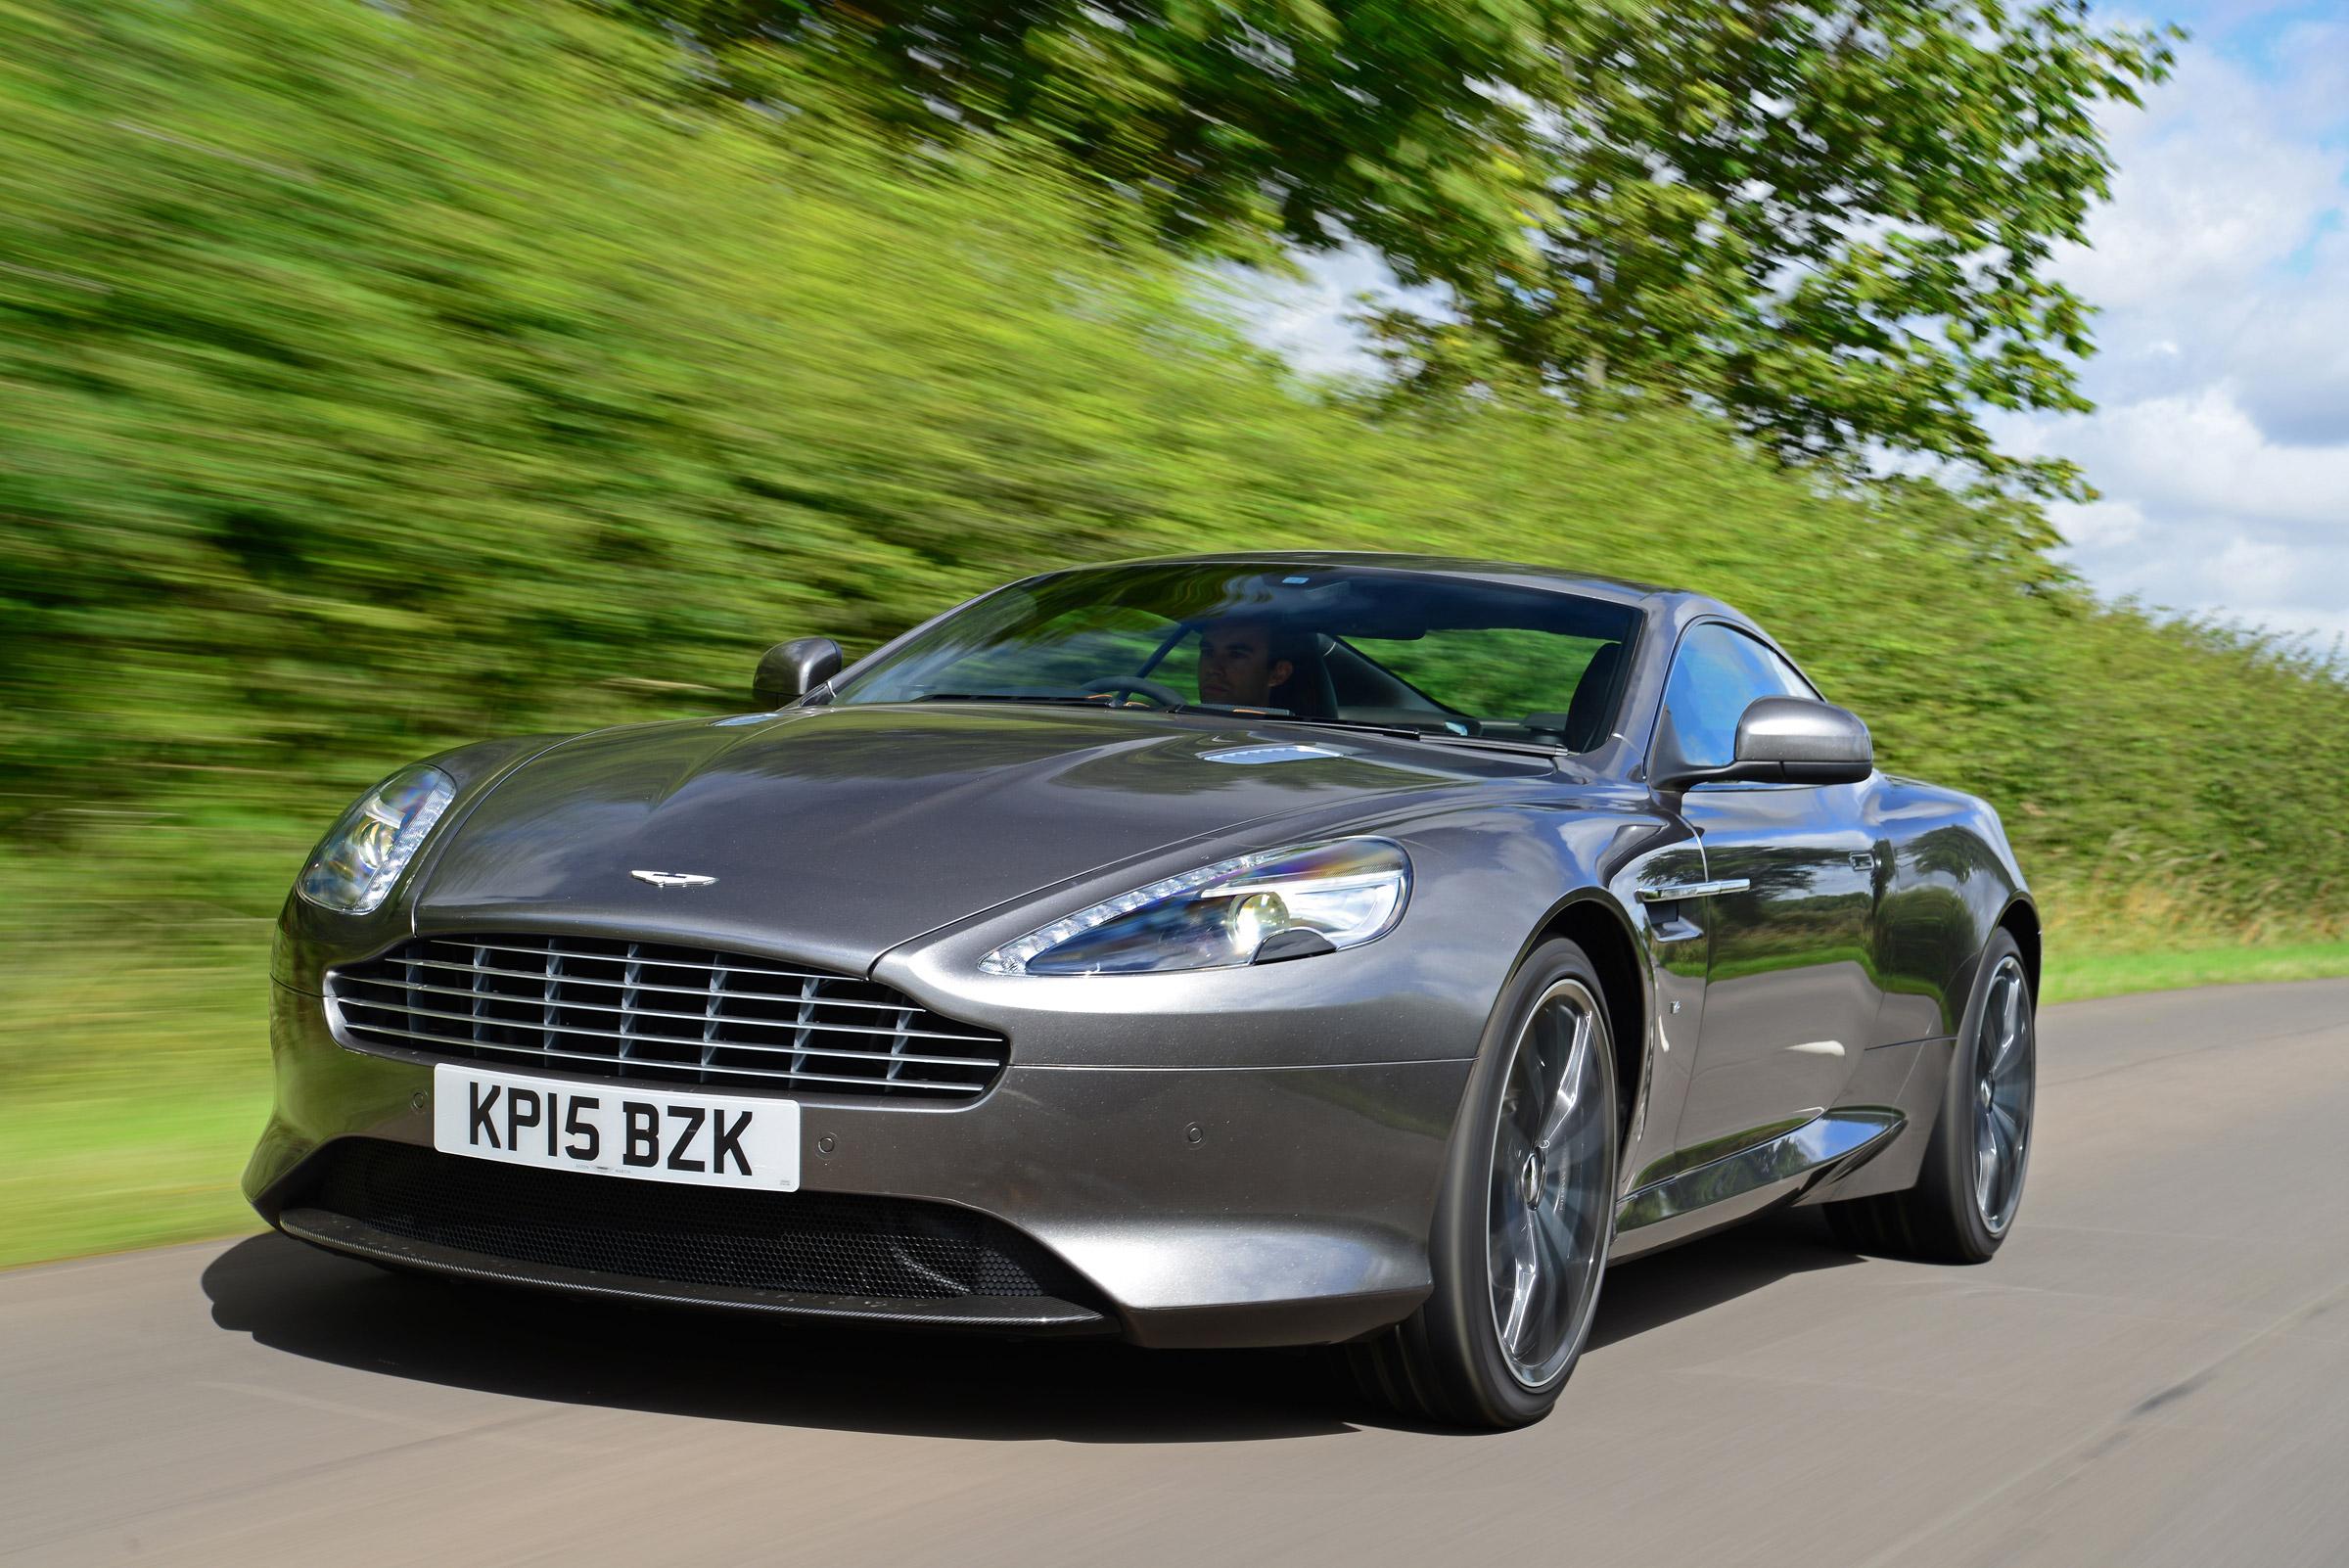 Aston Martin Db9 Gt 2015 Review Auto Express